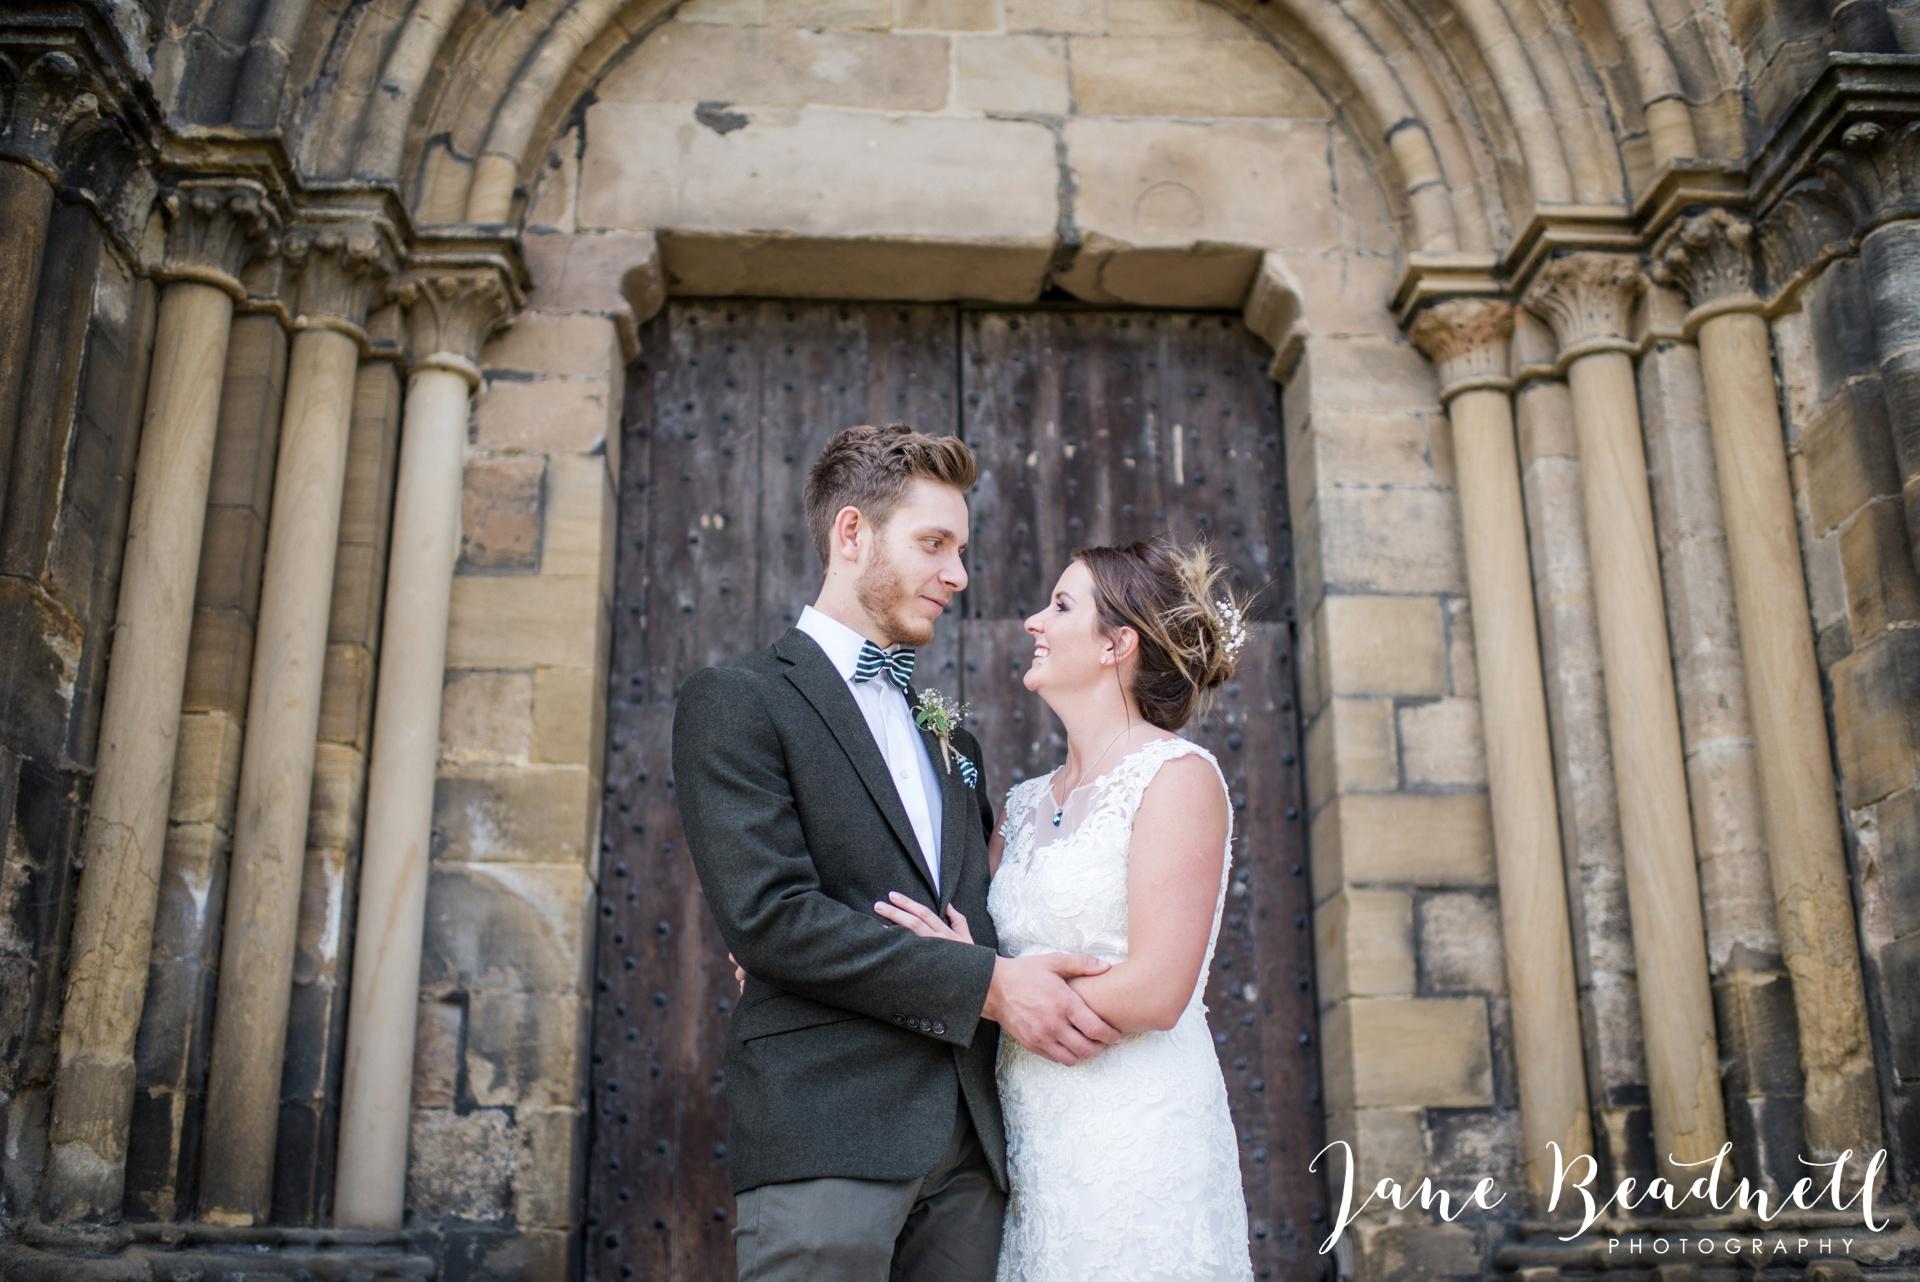 Jane Beadnell fine art wedding photographer The Old Deanery Ripon_0083